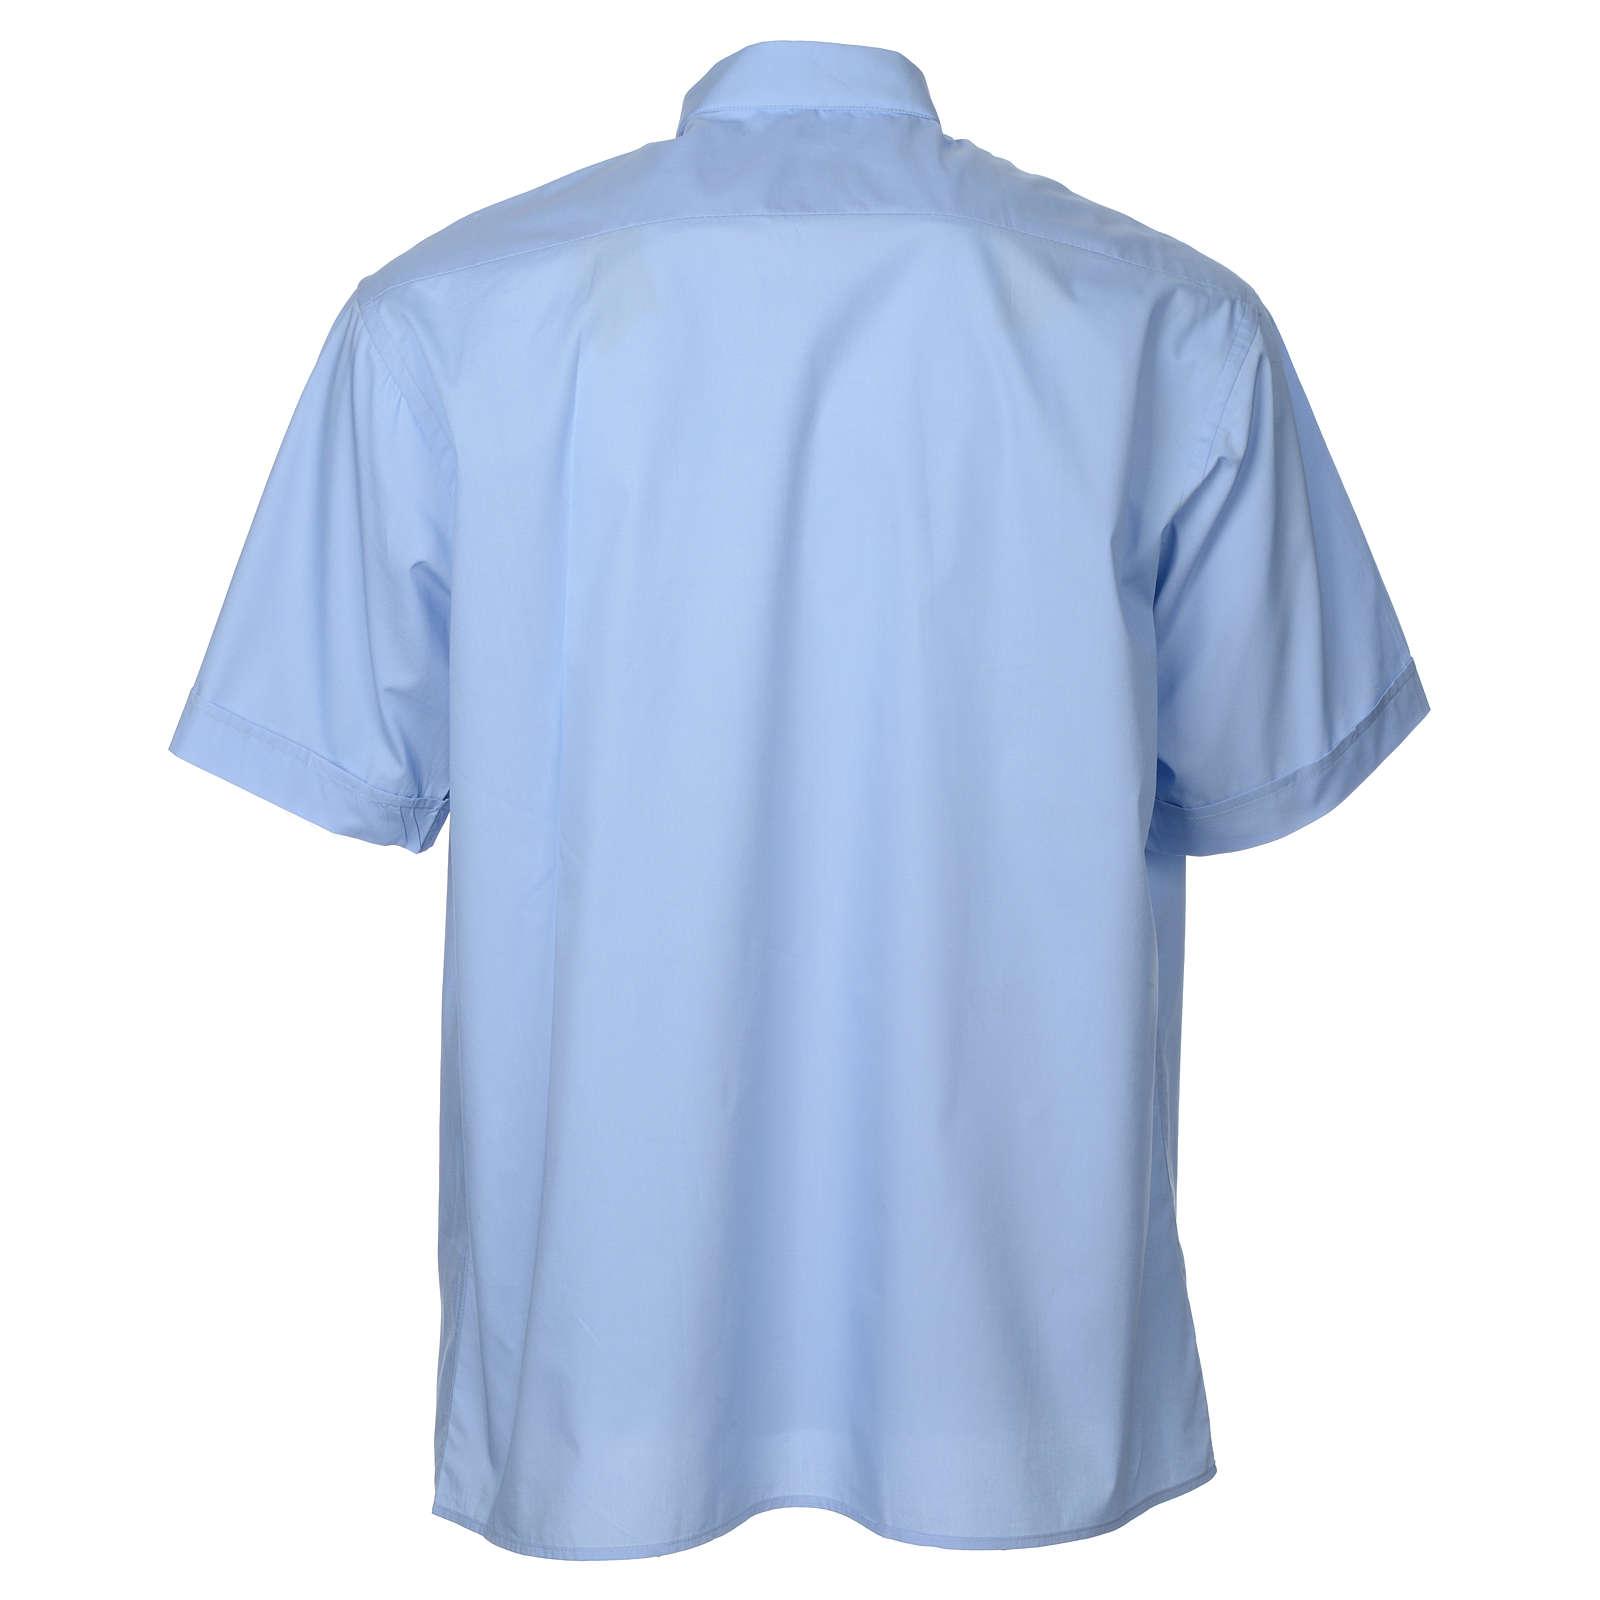 STOCK Camisa manga corta mezcla algodón celeste 4